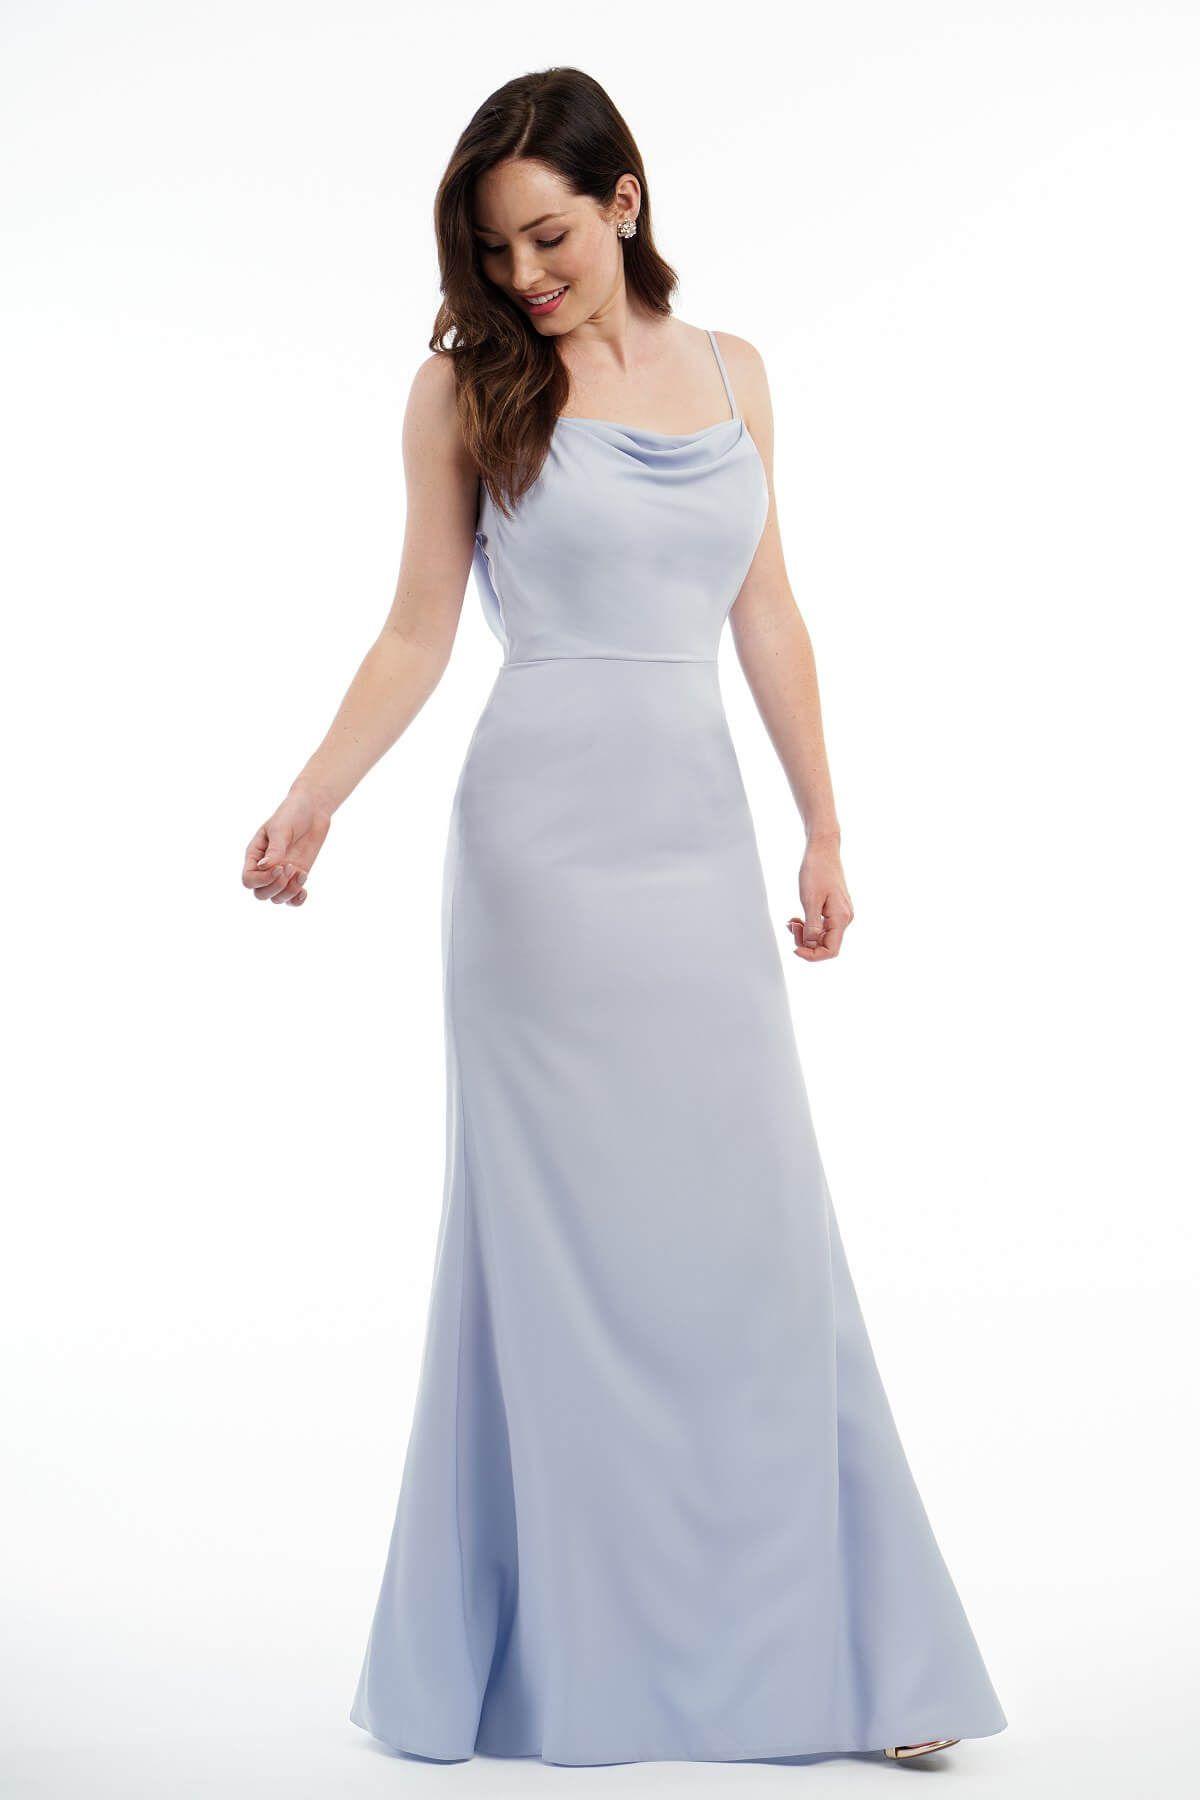 1d8b48f5329d4 Jasmine Bridesmaids Dresses, Beautiful Bridesmaid Dresses, Bridal Wedding  Dresses, Long Bridesmaid Dresses,